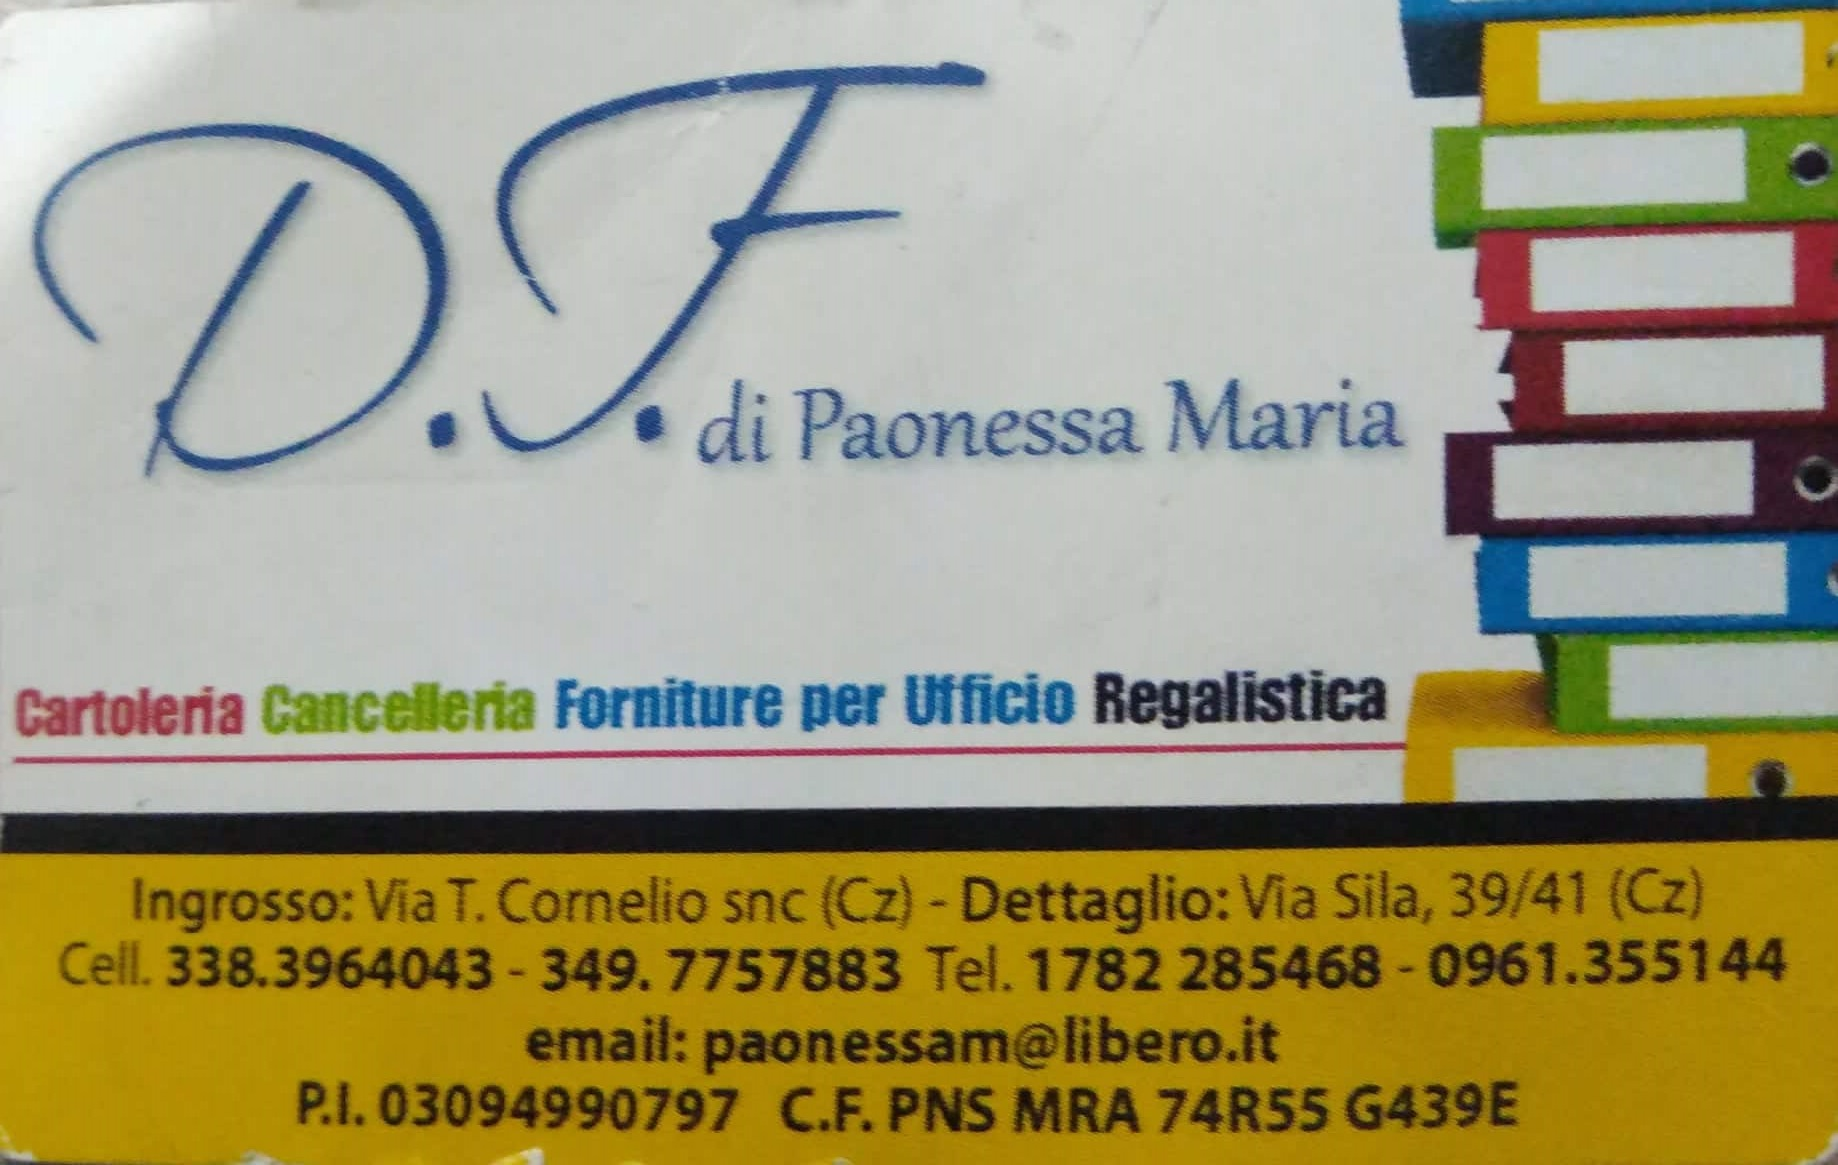 http://usdgimigliano.it/wp-content/uploads/2019/08/DF-Paonessa.jpg